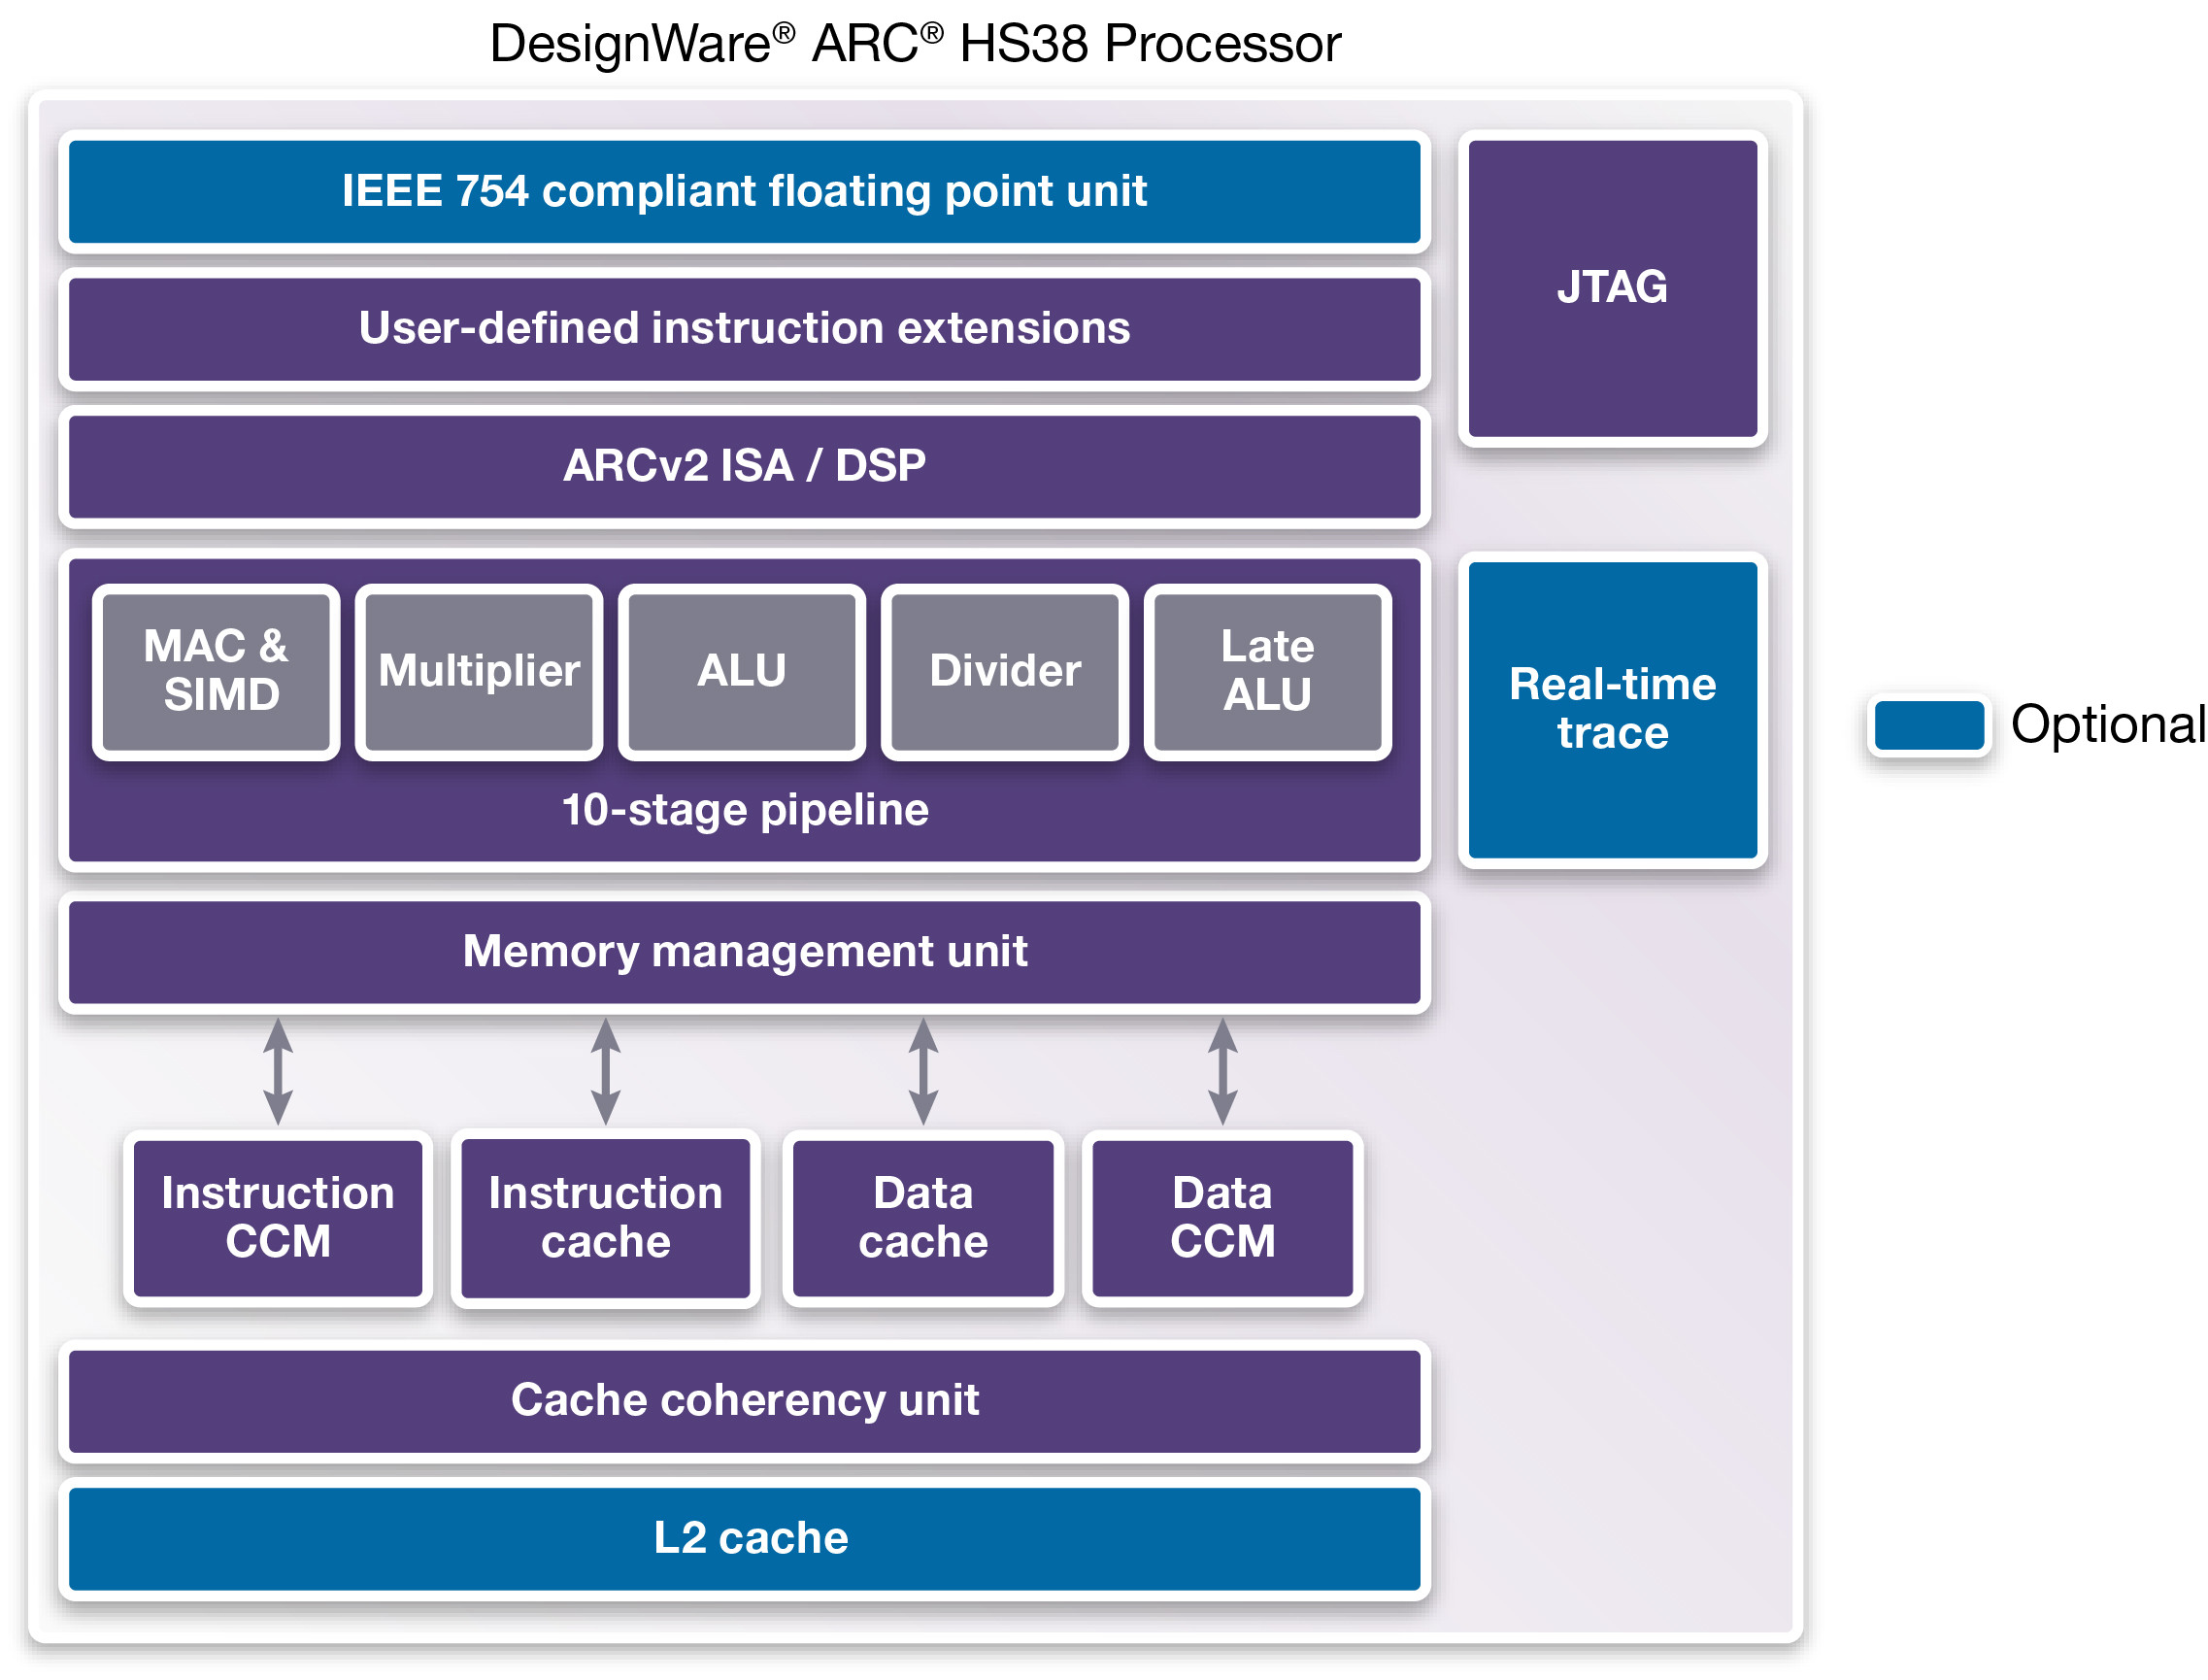 DesignWare ARC HS38 processor IP core